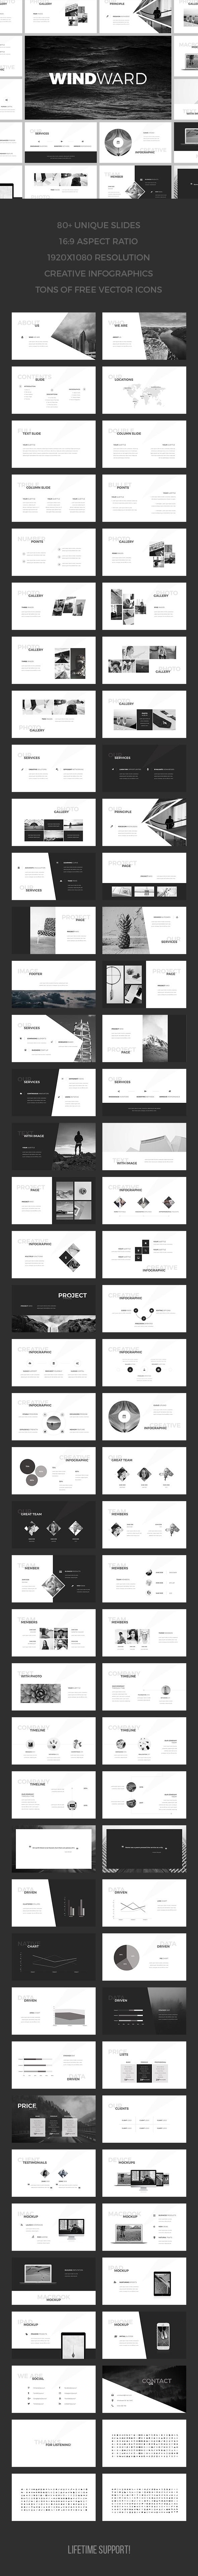 WindWard PowerPoint Template (PowerPoint Templates)